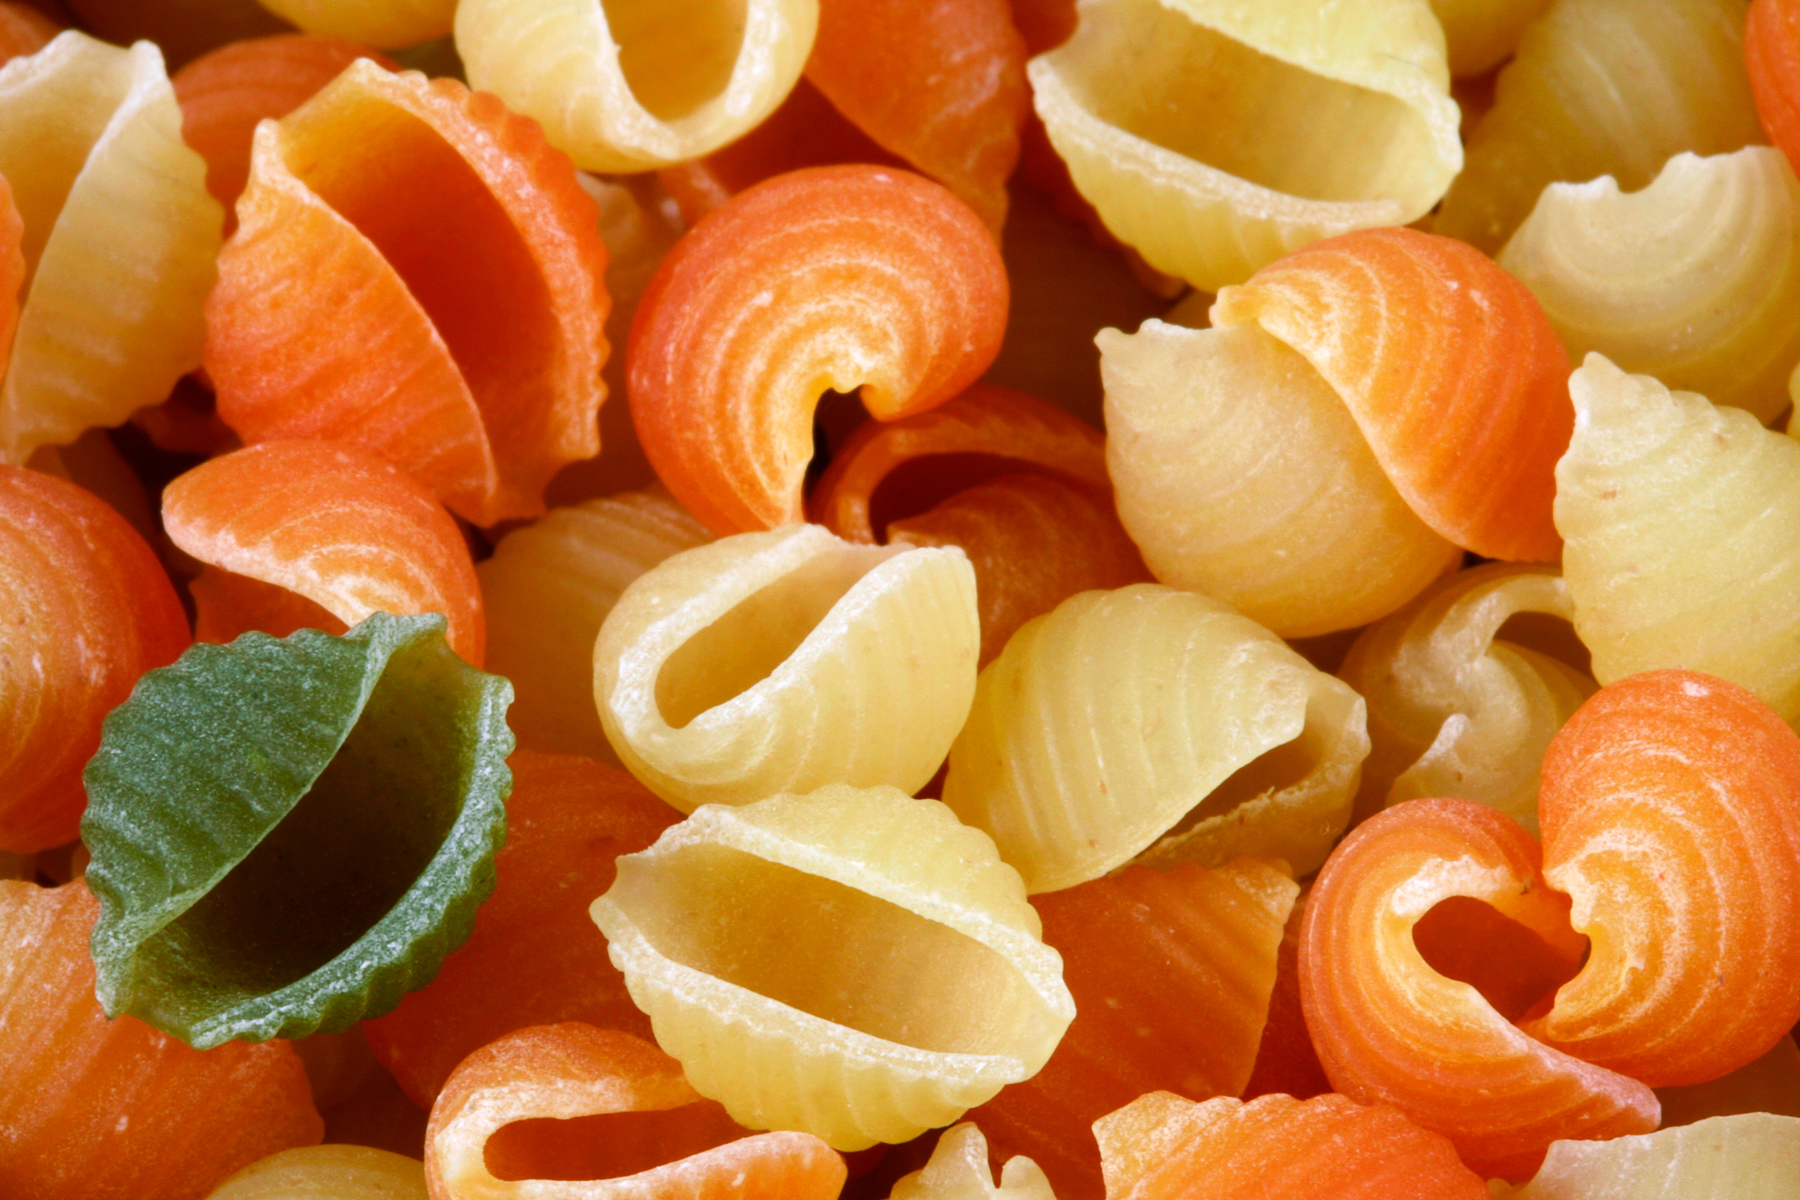 Odd Pasta Out, Alone, Shell, Nutritious, Orange, HQ Photo